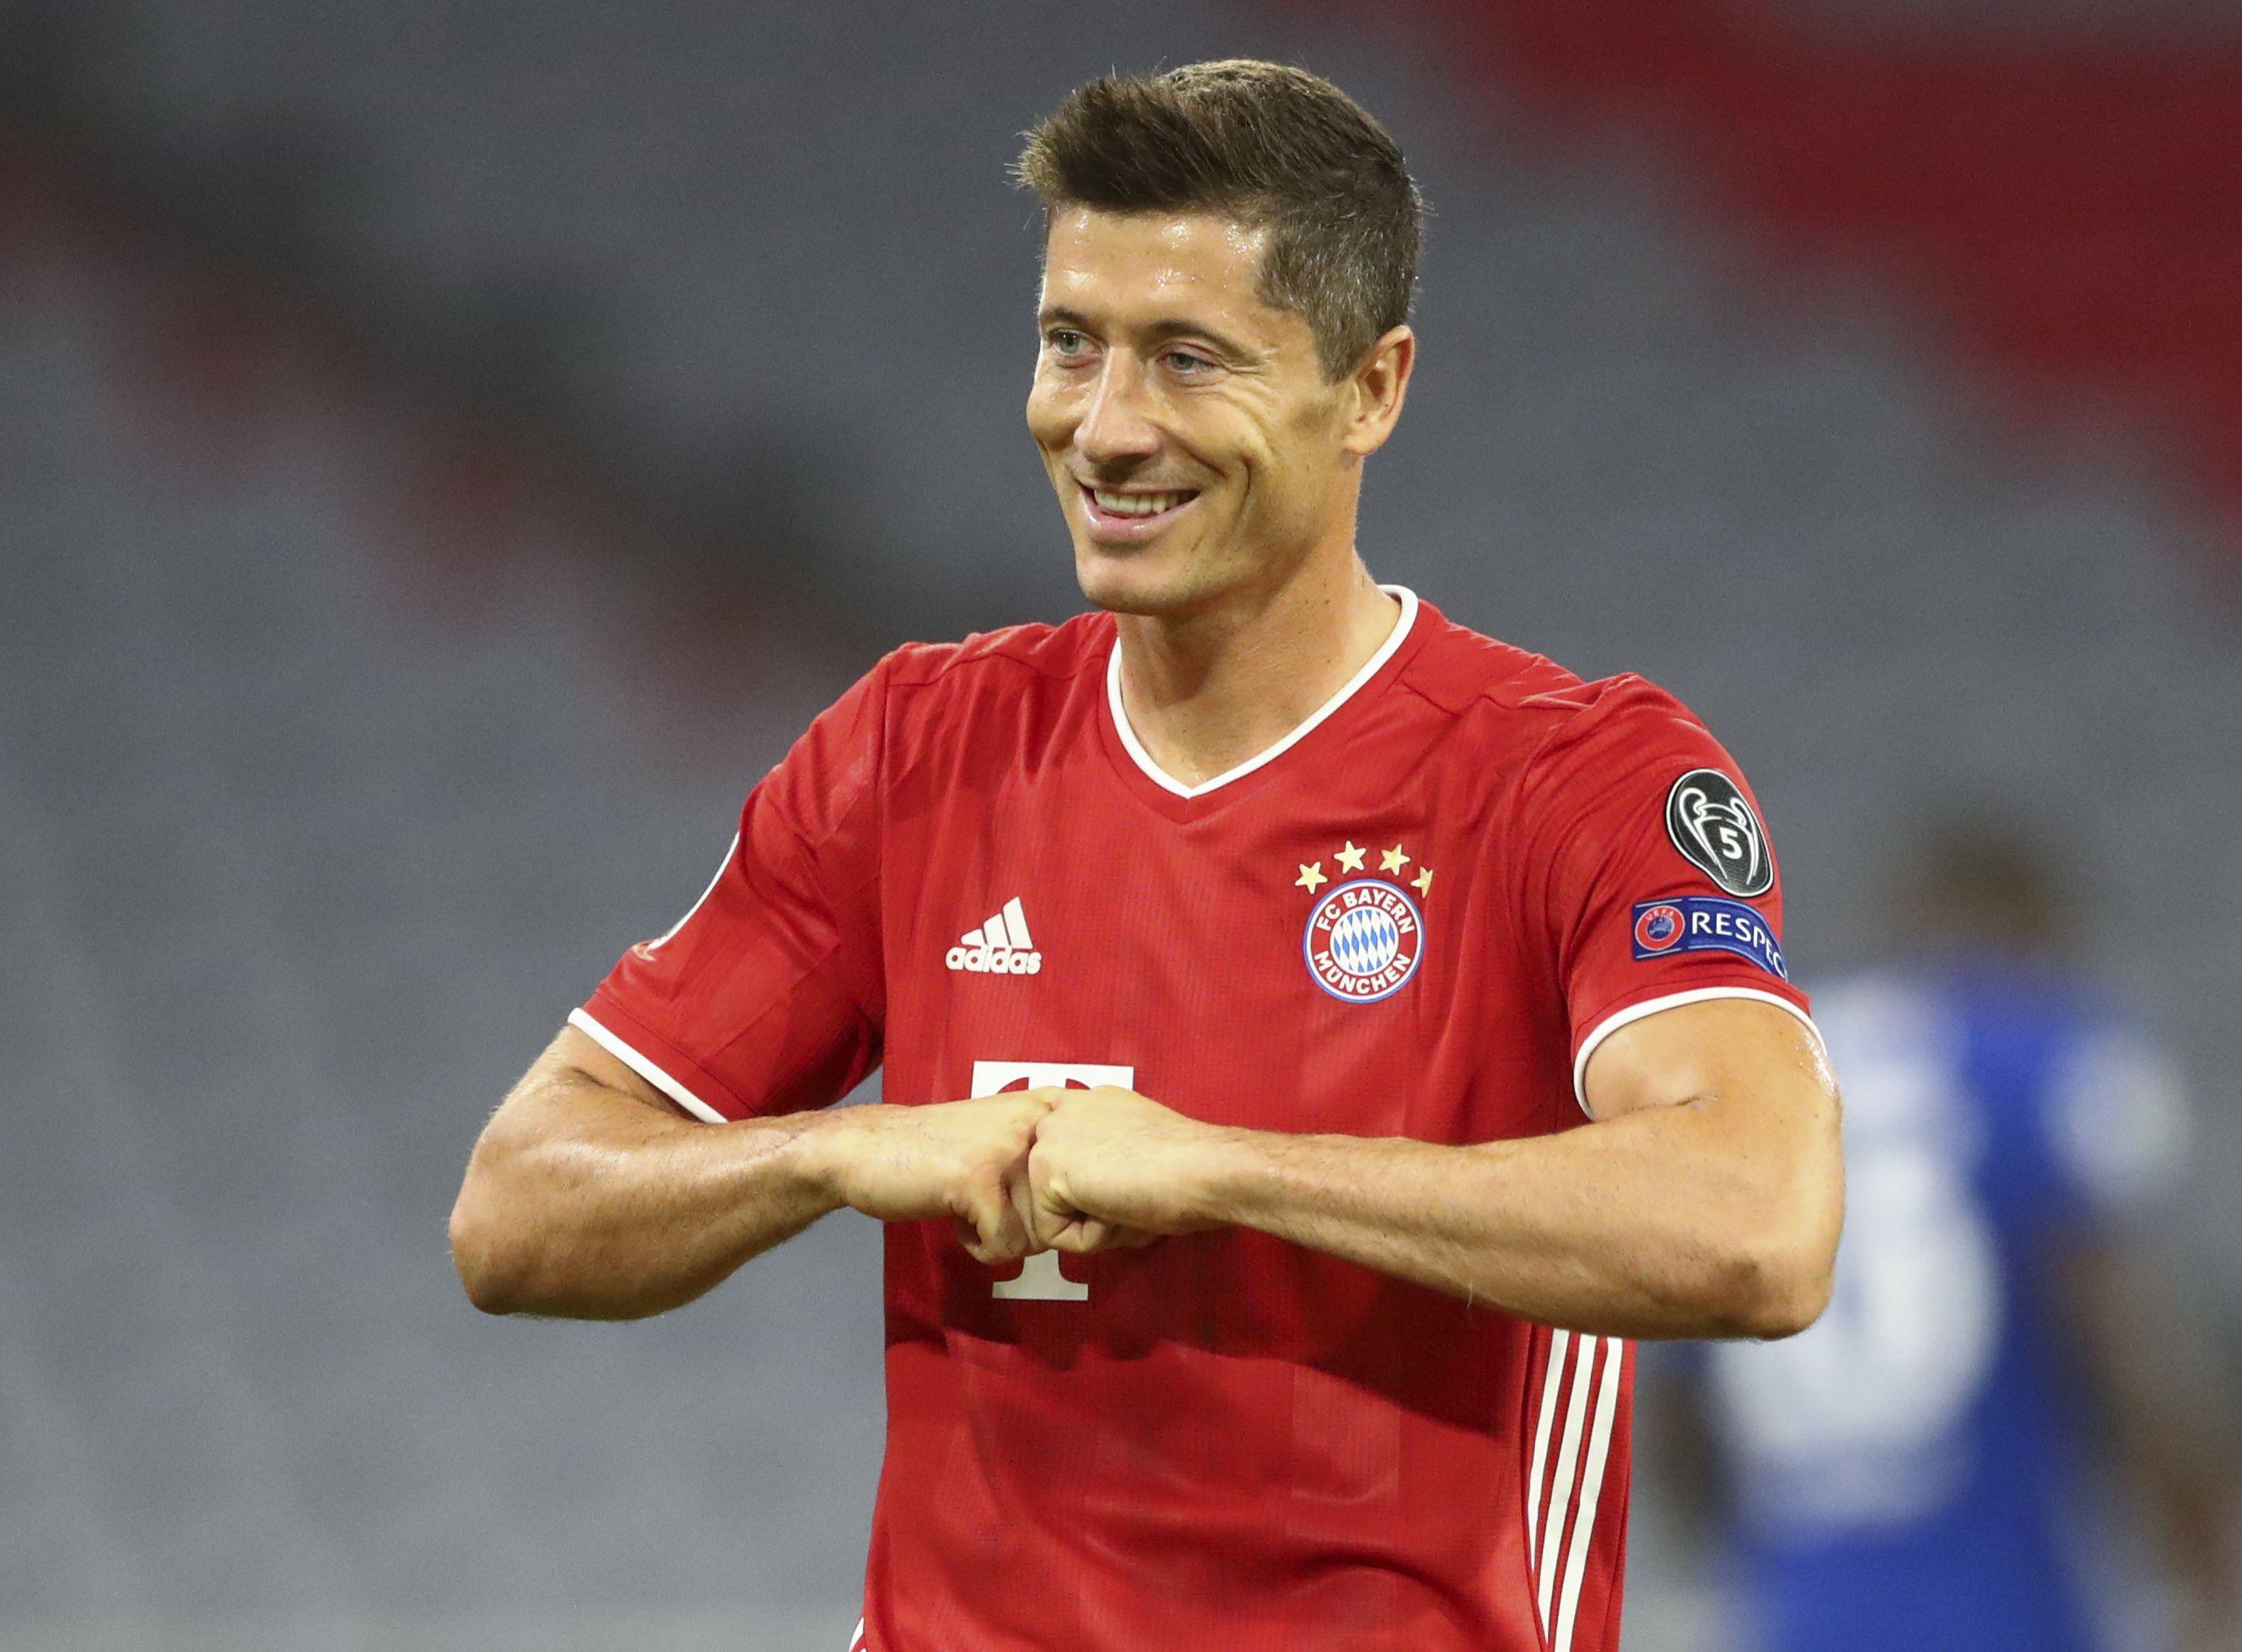 Bayern Munich Vs Lyon Live Stream Start Time Tv Channel How To Watch Champions League Semifinal 2020 Masslive Com